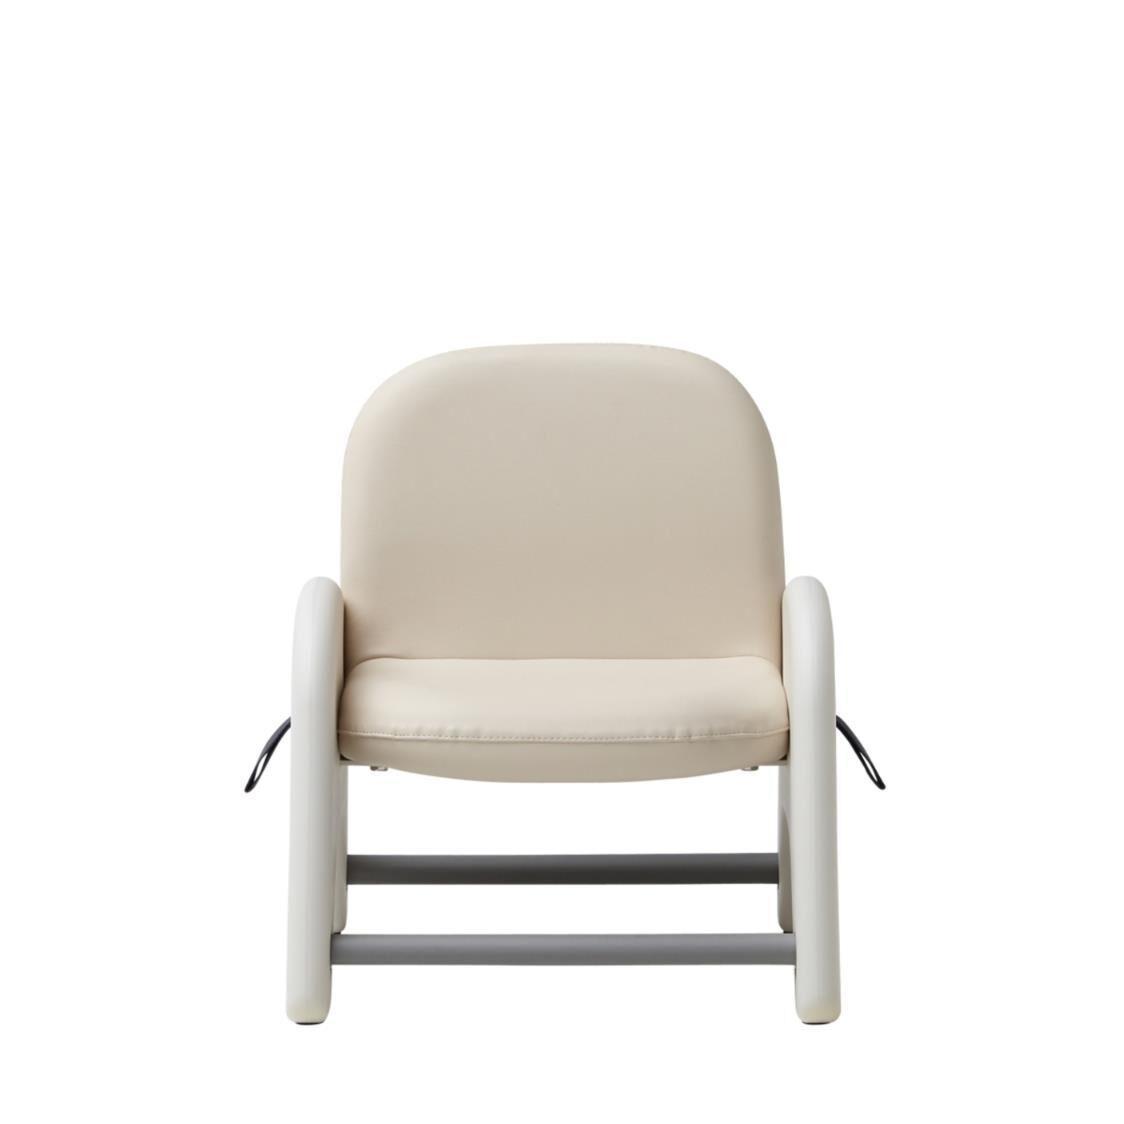 Iloom Atti-i Chair HCH2000A-A440P